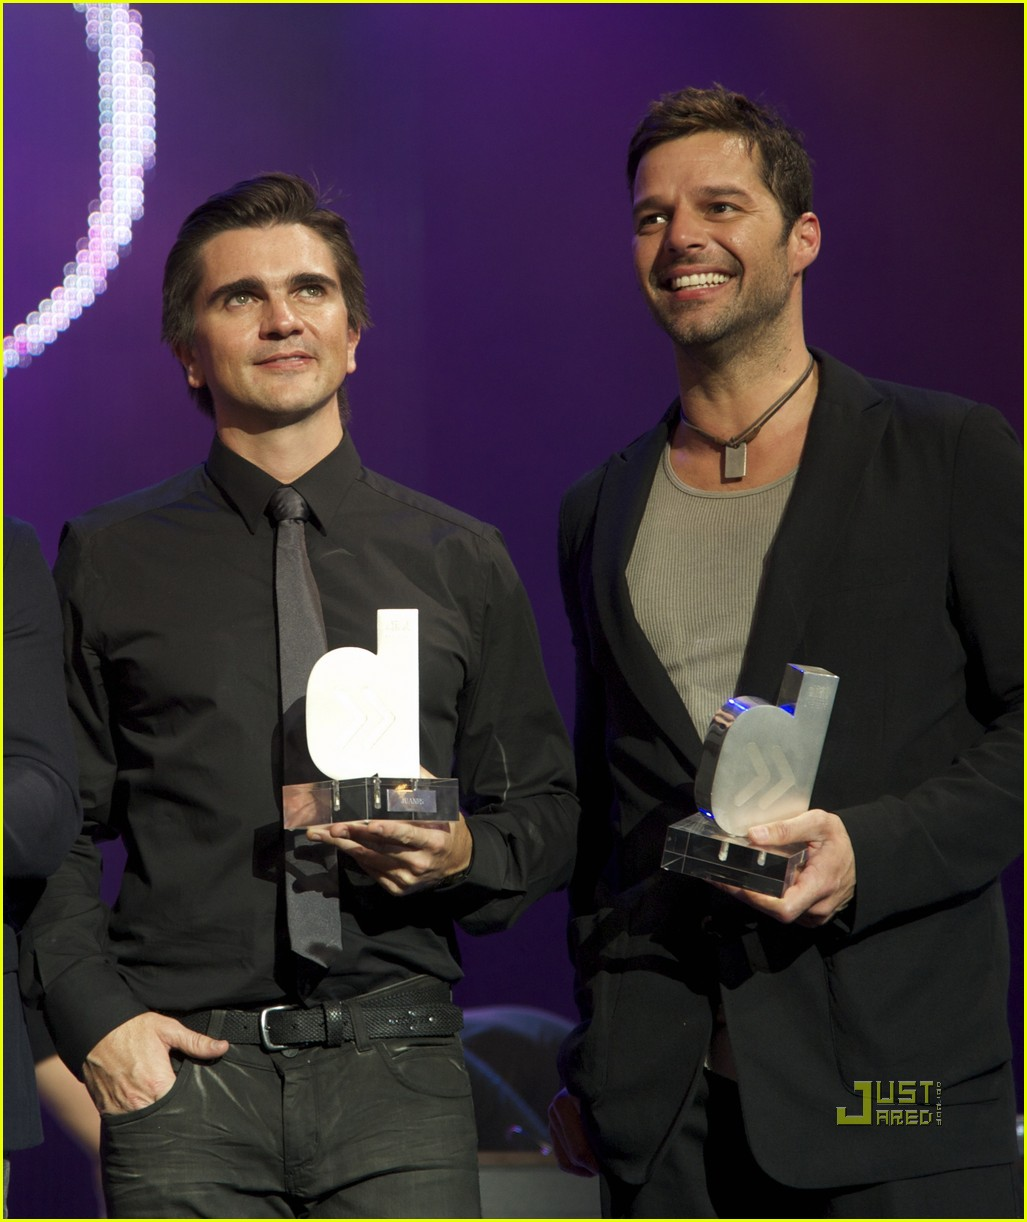 http://4.bp.blogspot.com/-zJMCAQ2qLvg/TWfARNgypGI/AAAAAAAAlDU/PnJ-kUd2nwo/s1600/ricky-martin-cadena-dial-awards-11.jpg